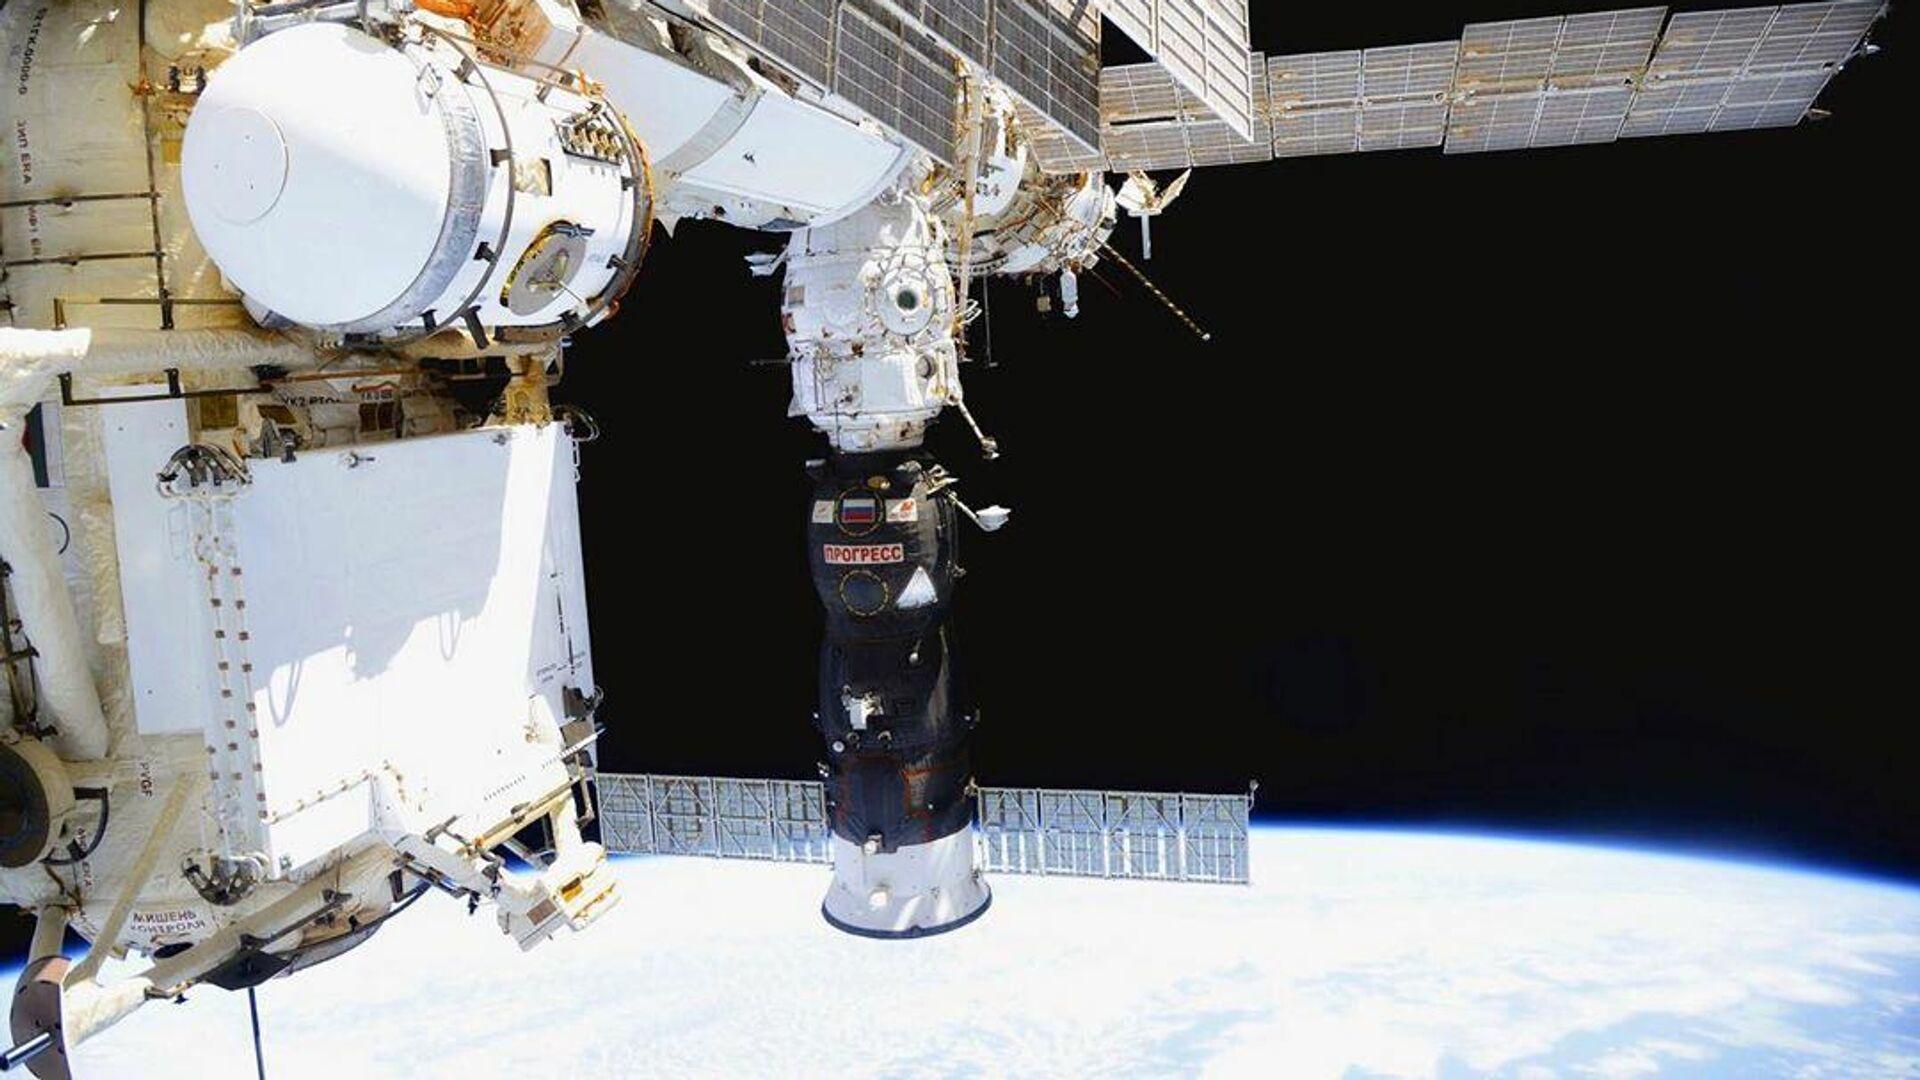 Американский прибор не нашел место утечки воздуха на МКС